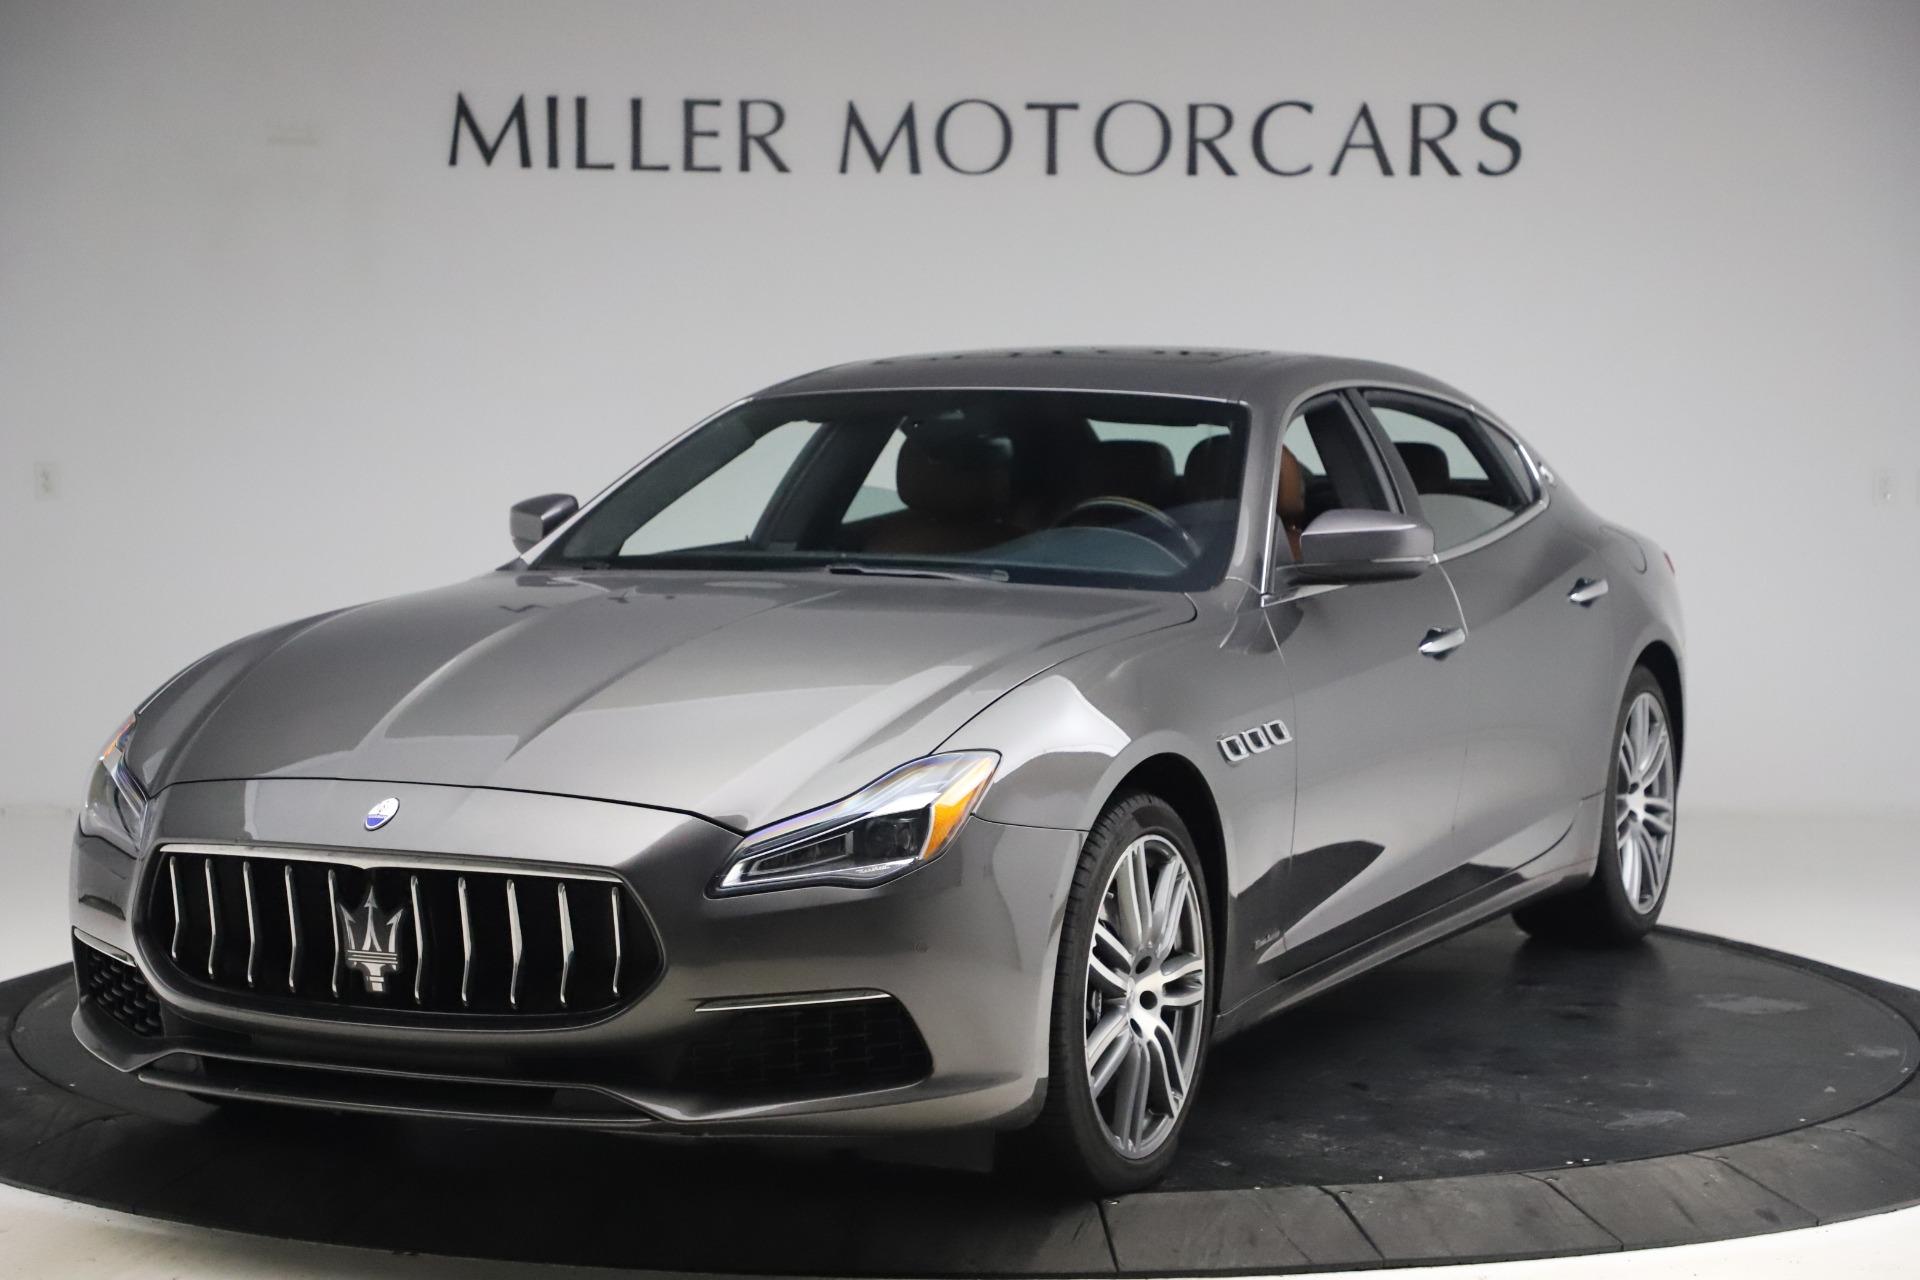 New 2018 Maserati Quattroporte S Q4 GranLusso for sale Sold at Bentley Greenwich in Greenwich CT 06830 1